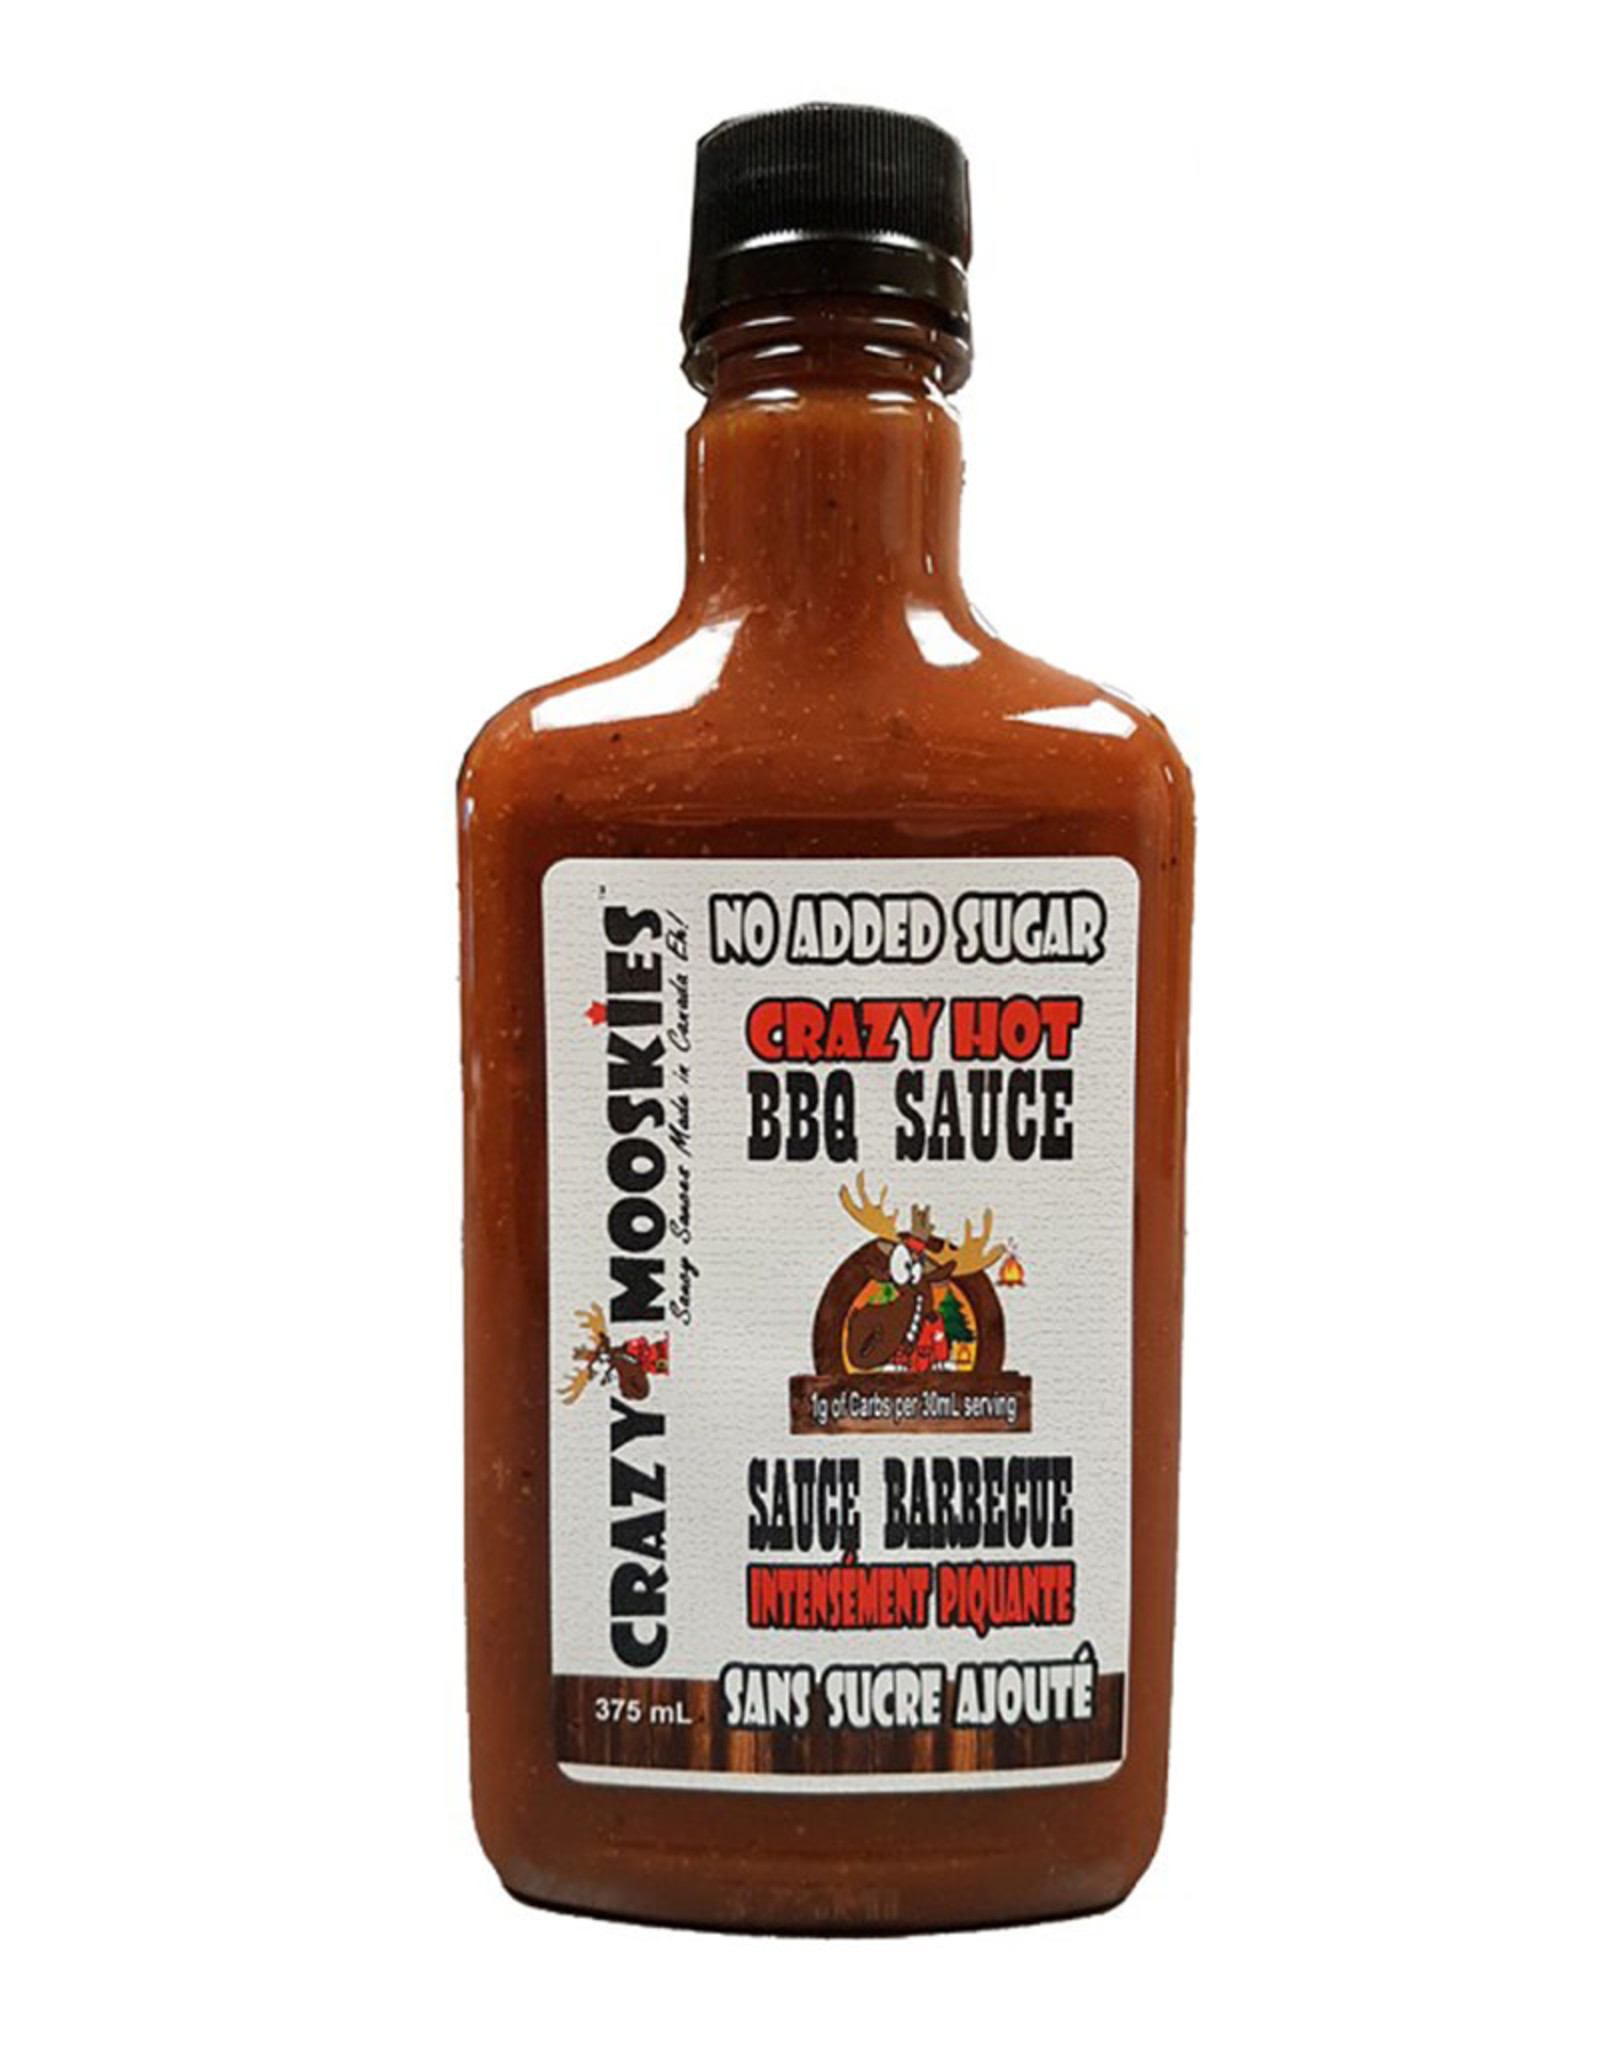 Crazy Mooskies Crazy Mooskies - No Sugar Added BBQ Sauce, Crazy Hot (375ml)